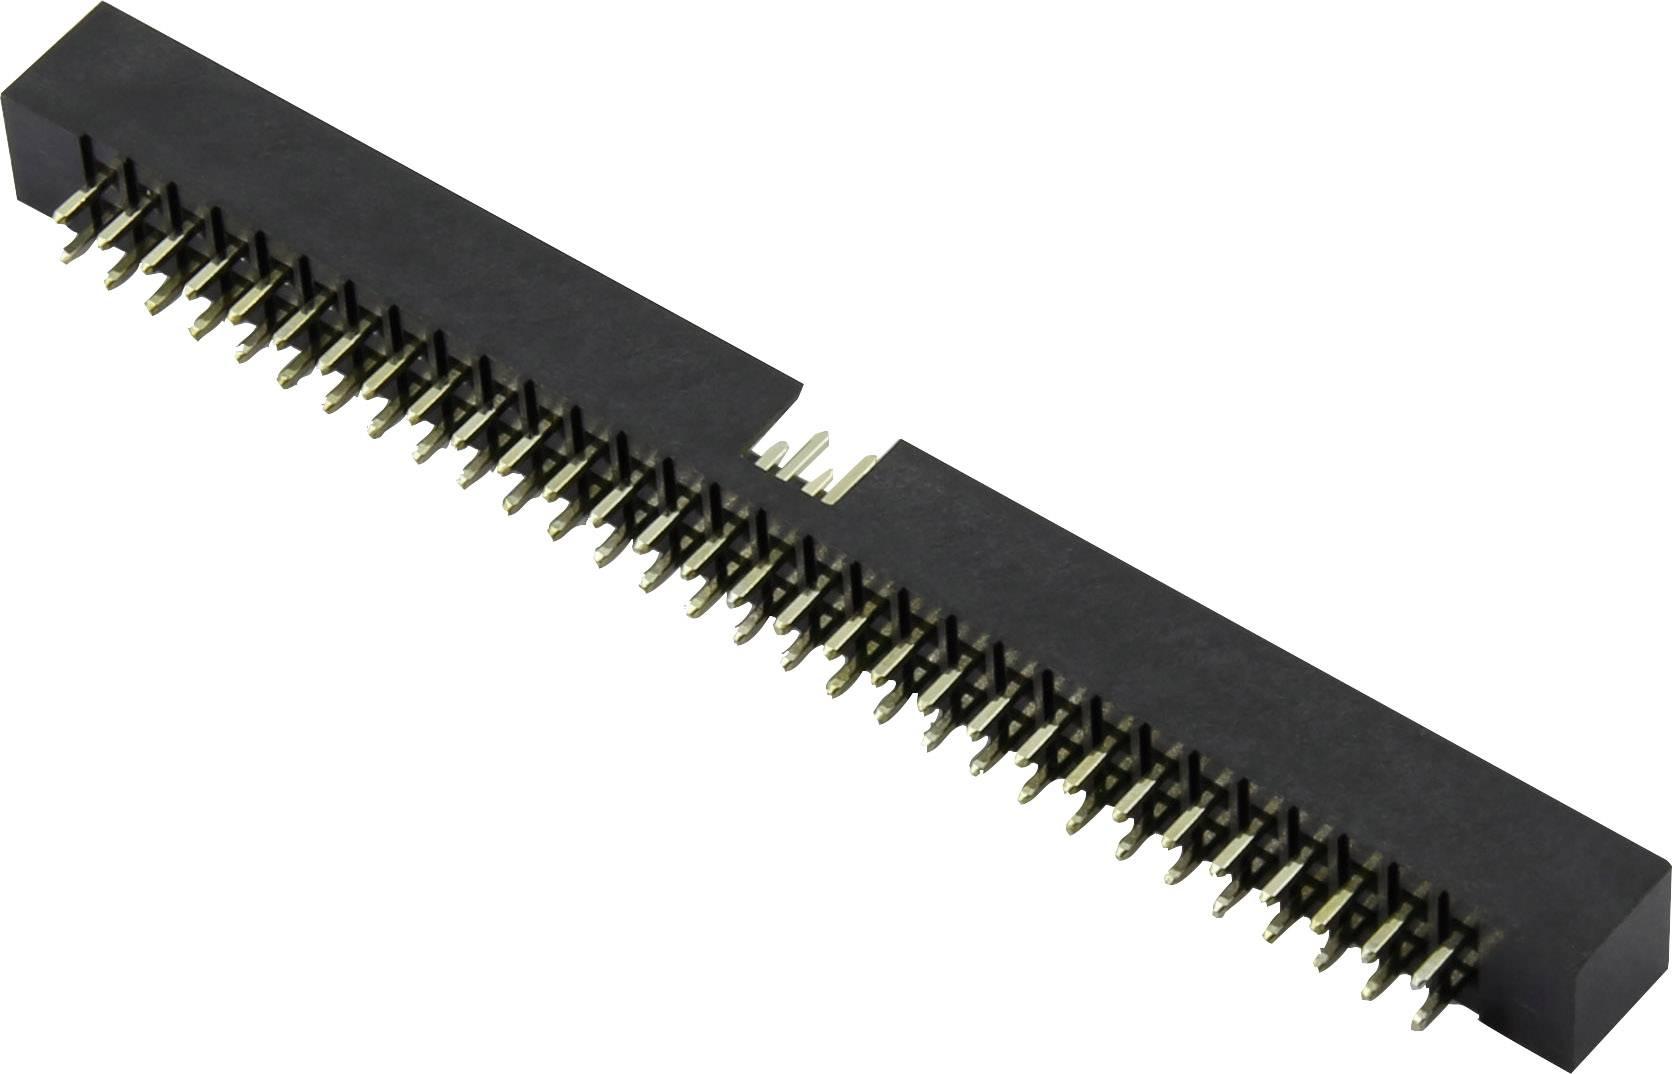 Konektor pro ploché kabely Connfly DS1014-10SF1B, rastr (rozteč): 2 mm, počet pólů: 10, 1 ks